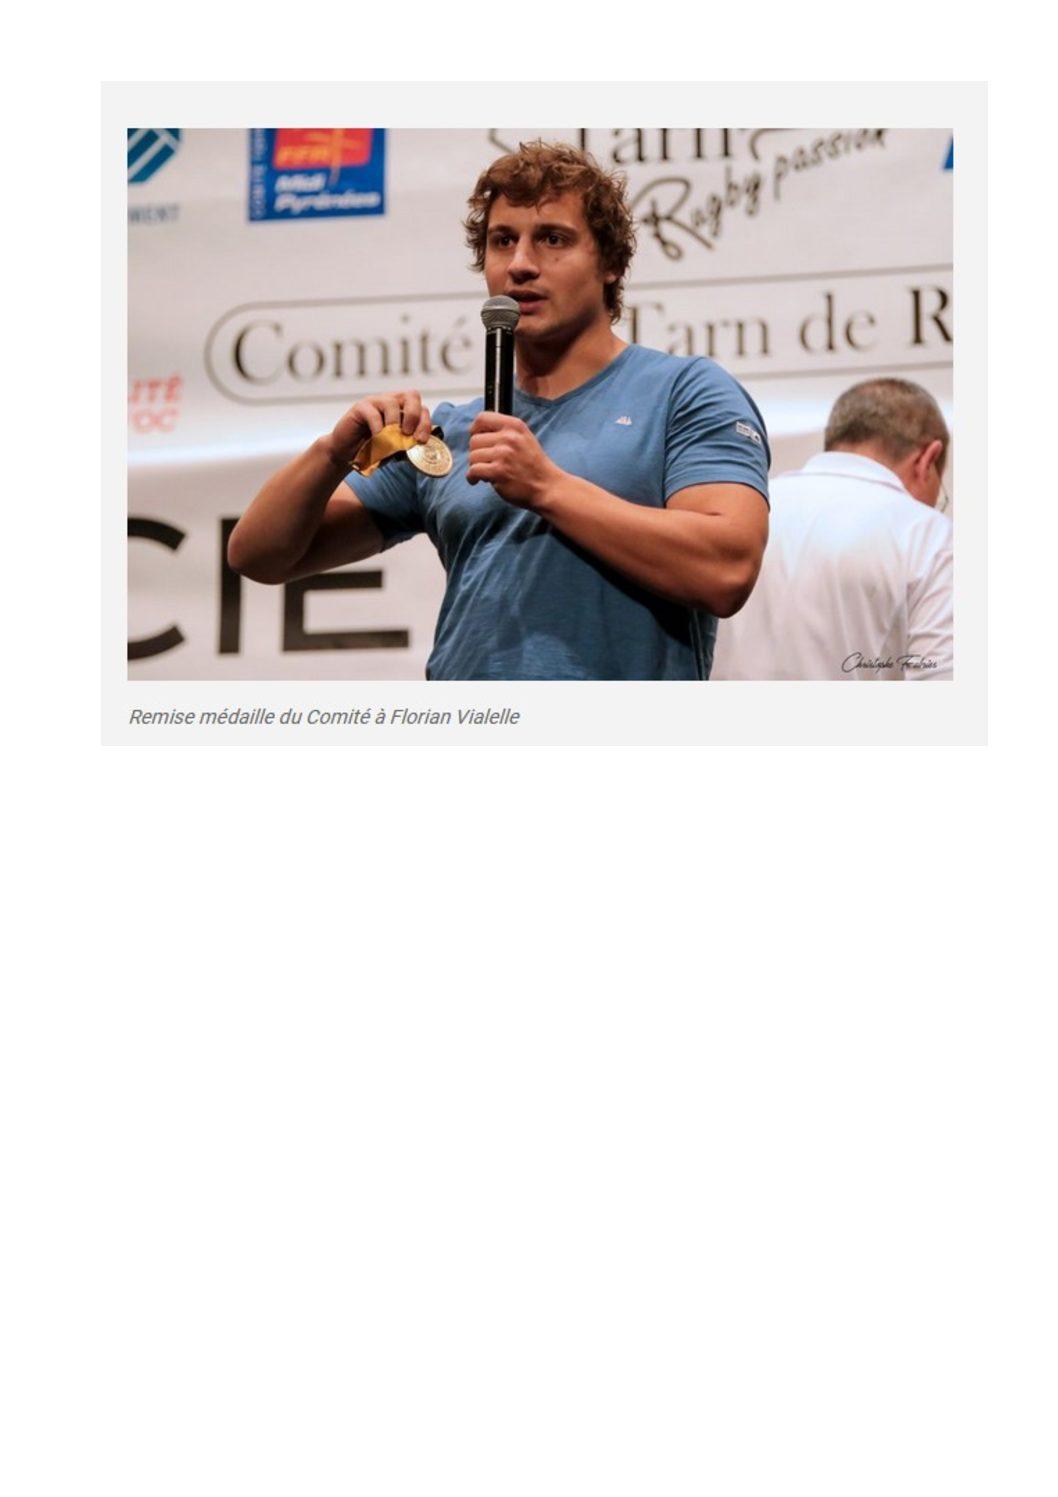 https://scg-rugby.com/wp-content/uploads/2018/06/TARN-10-pdf.jpg